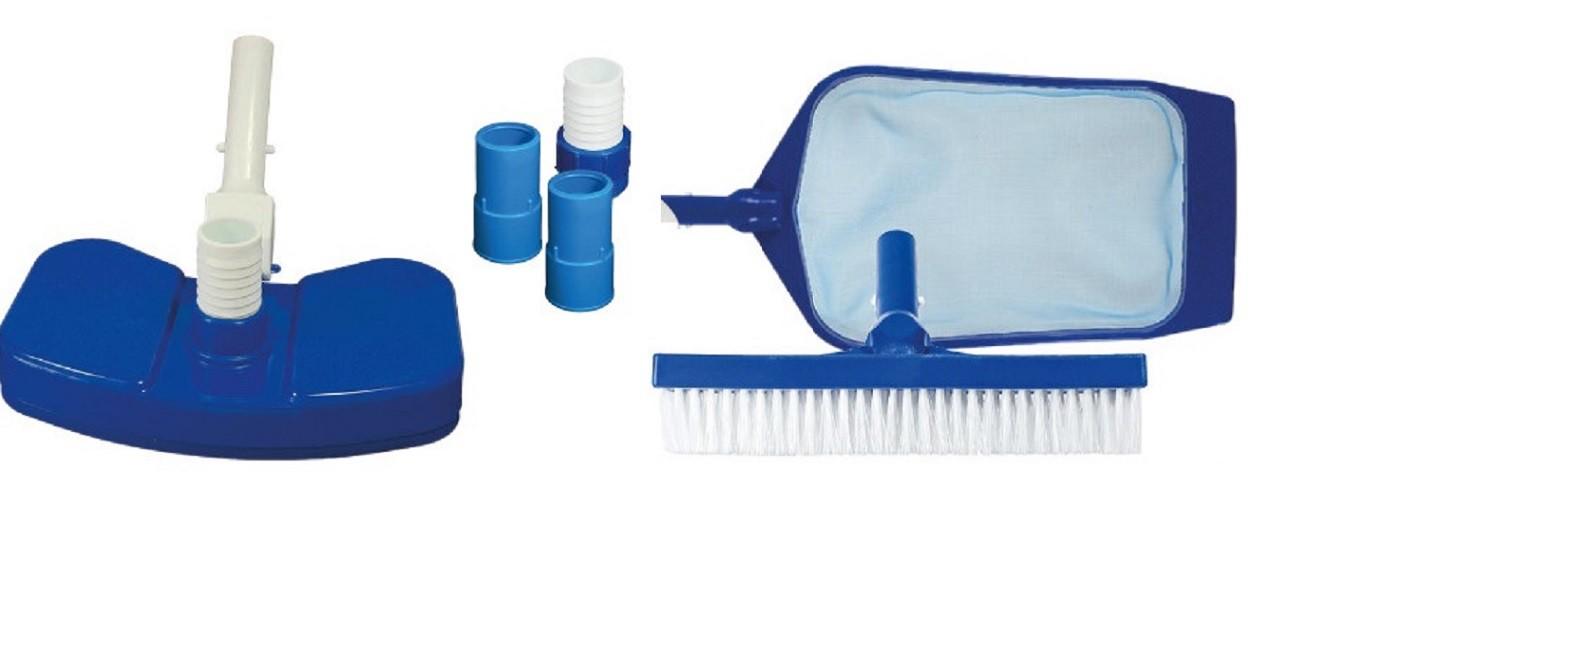 Kit Básico para Limpeza de Piscina Fibra, Alvenaria e Vinil 6 Peças - Brustec